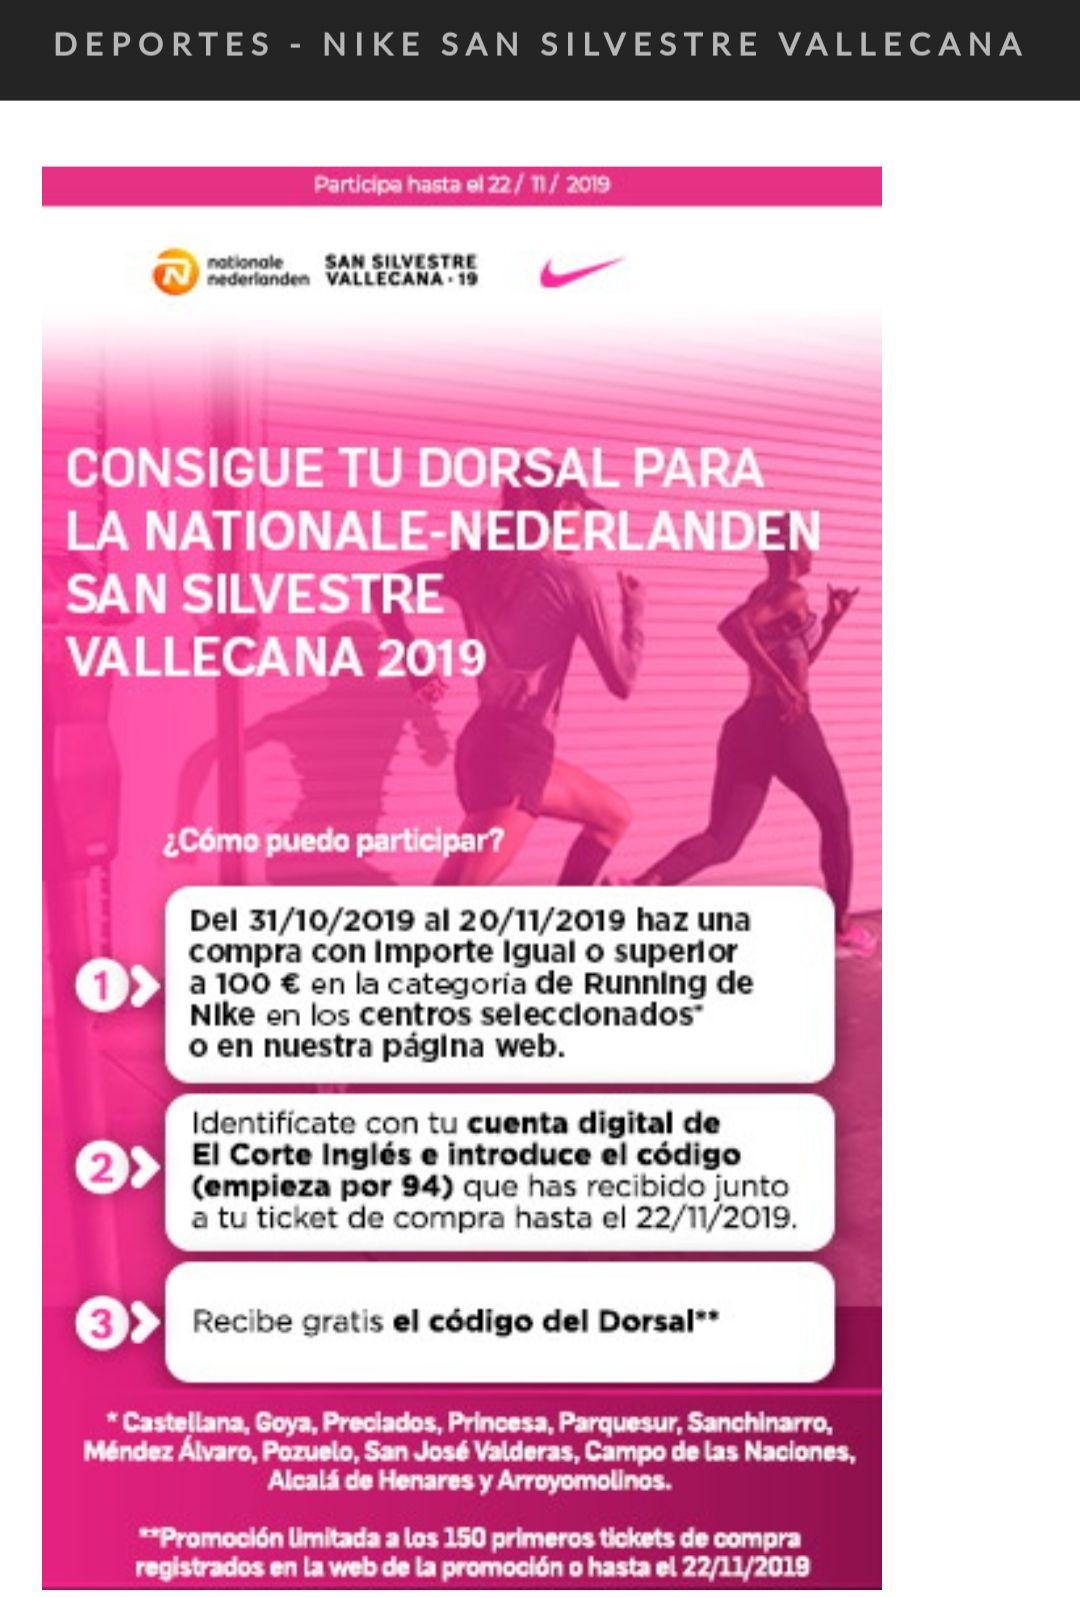 Dorsal San Silvestre Vallecana gratis - Gasto min. de 100€